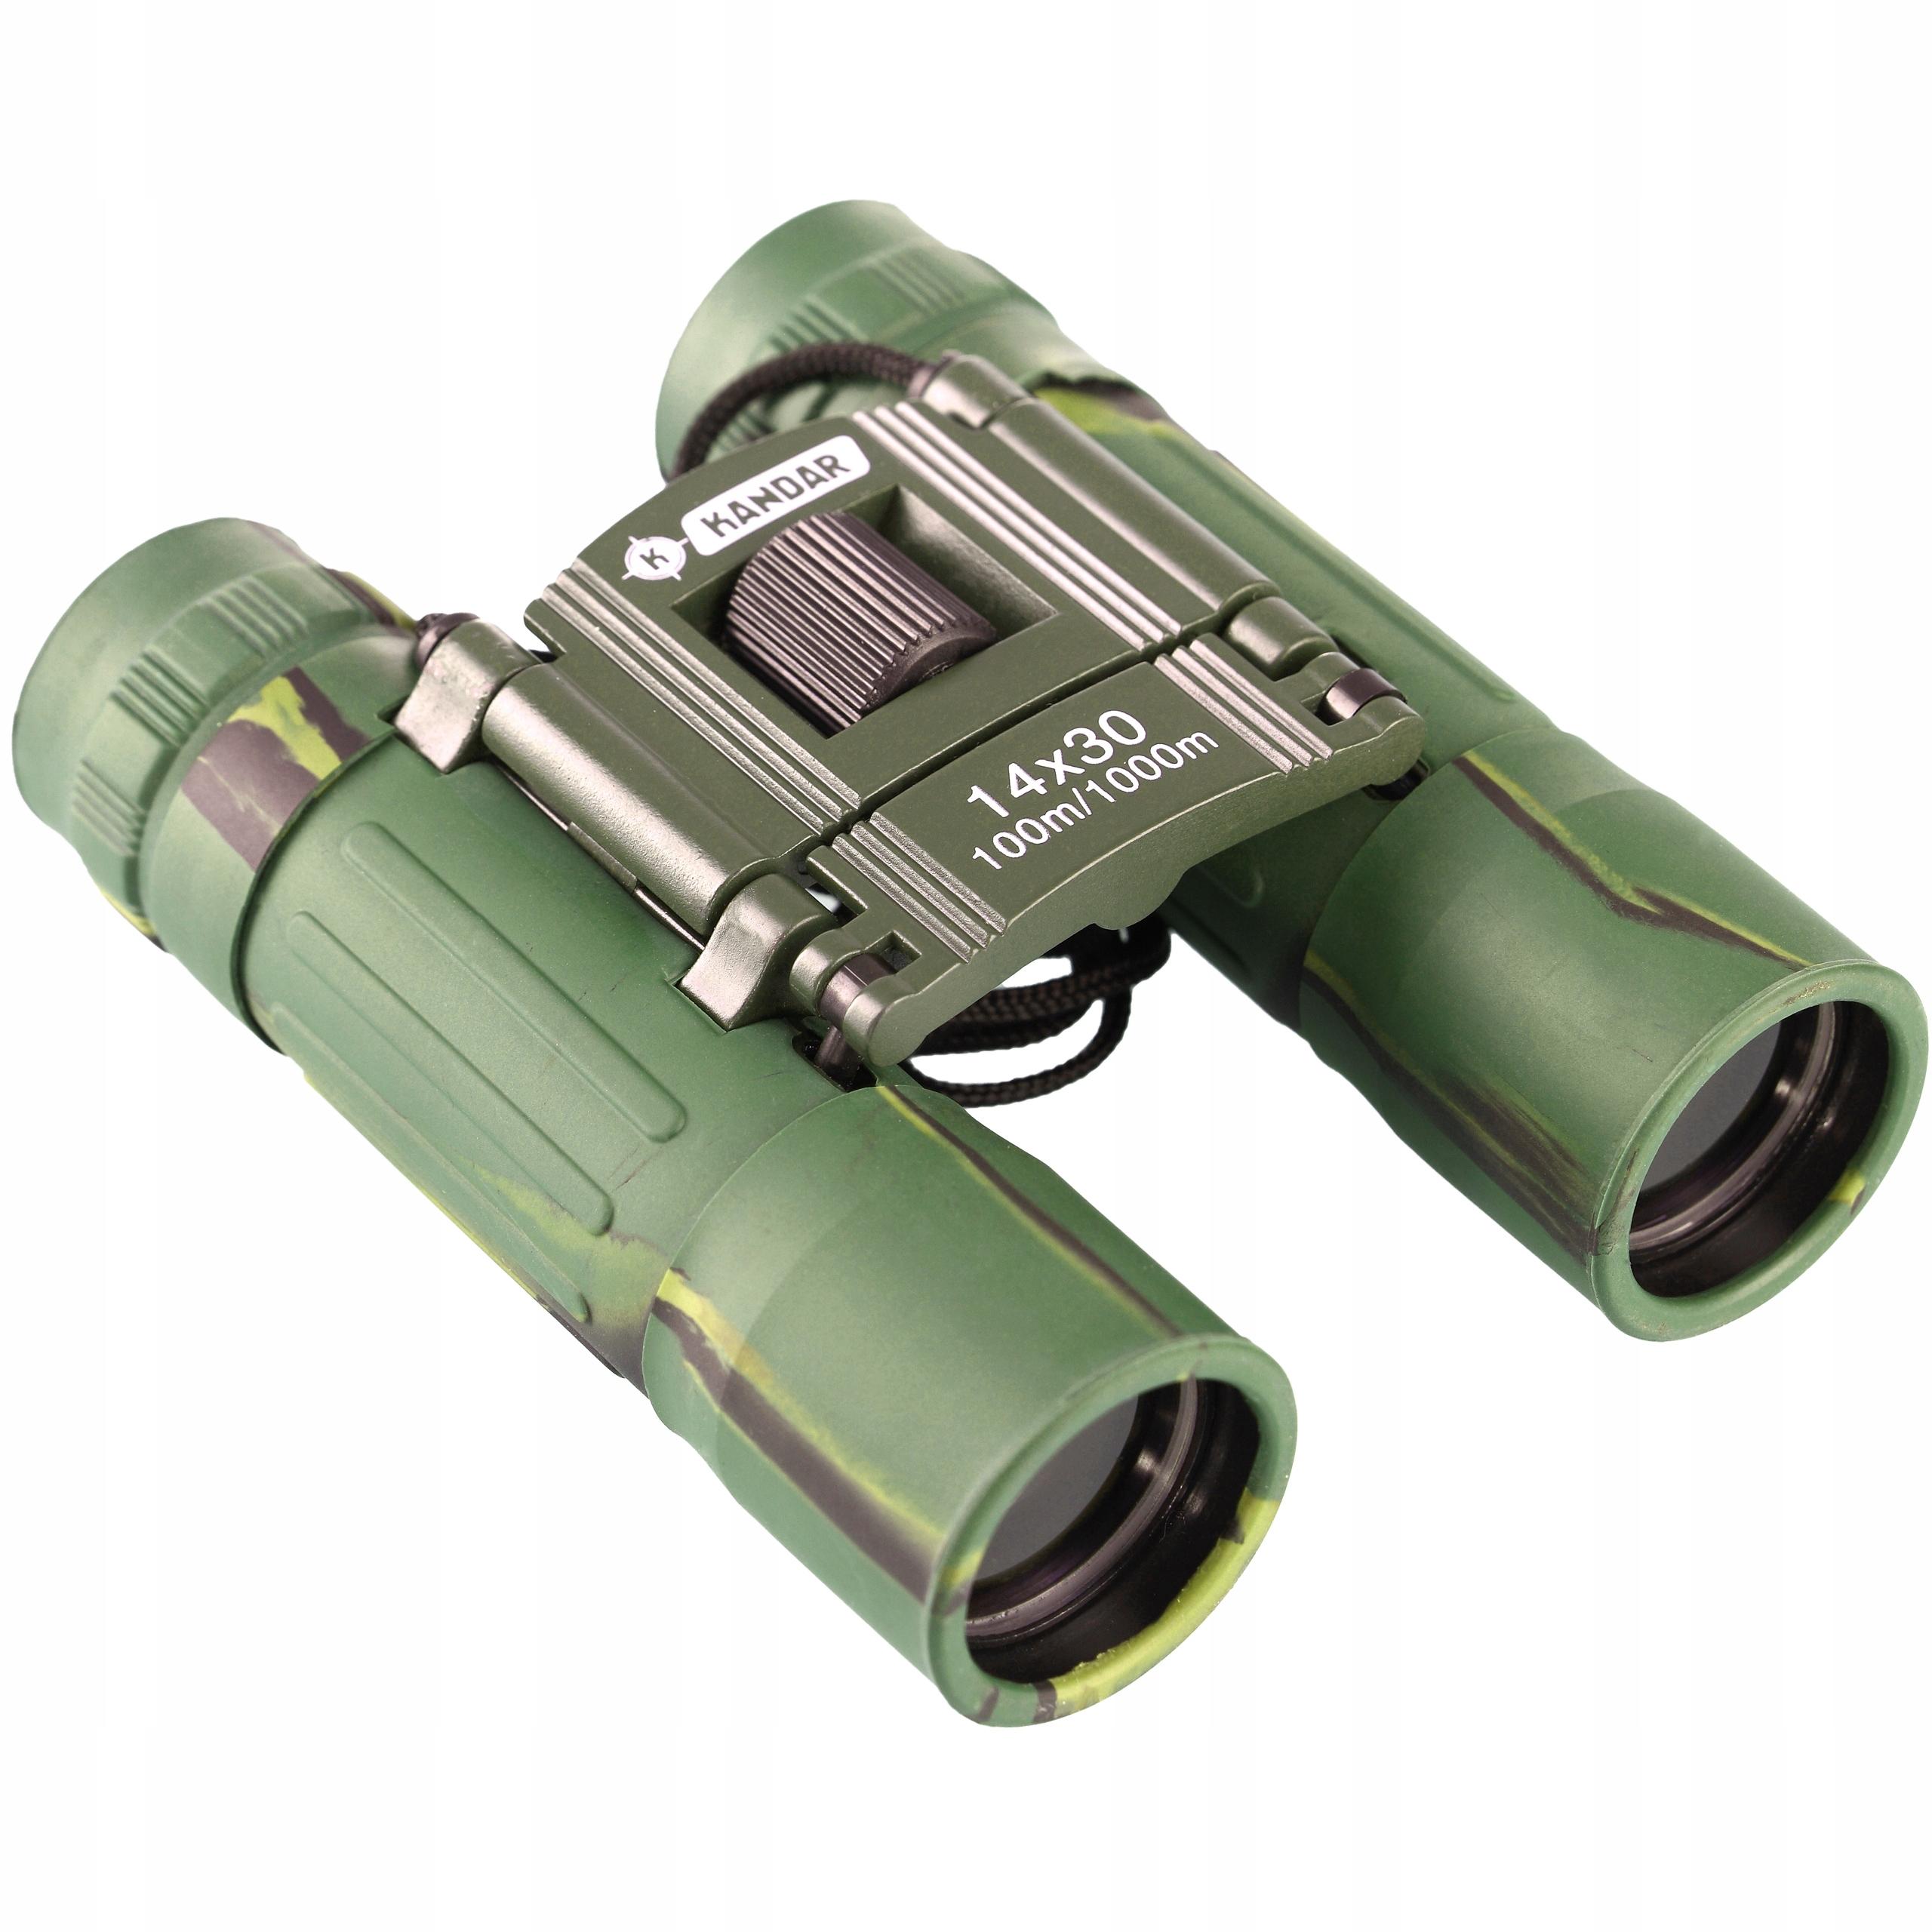 Item BINOCULARS, KANDAR 14x30 COMPACT BK-7 HD-HUNTING